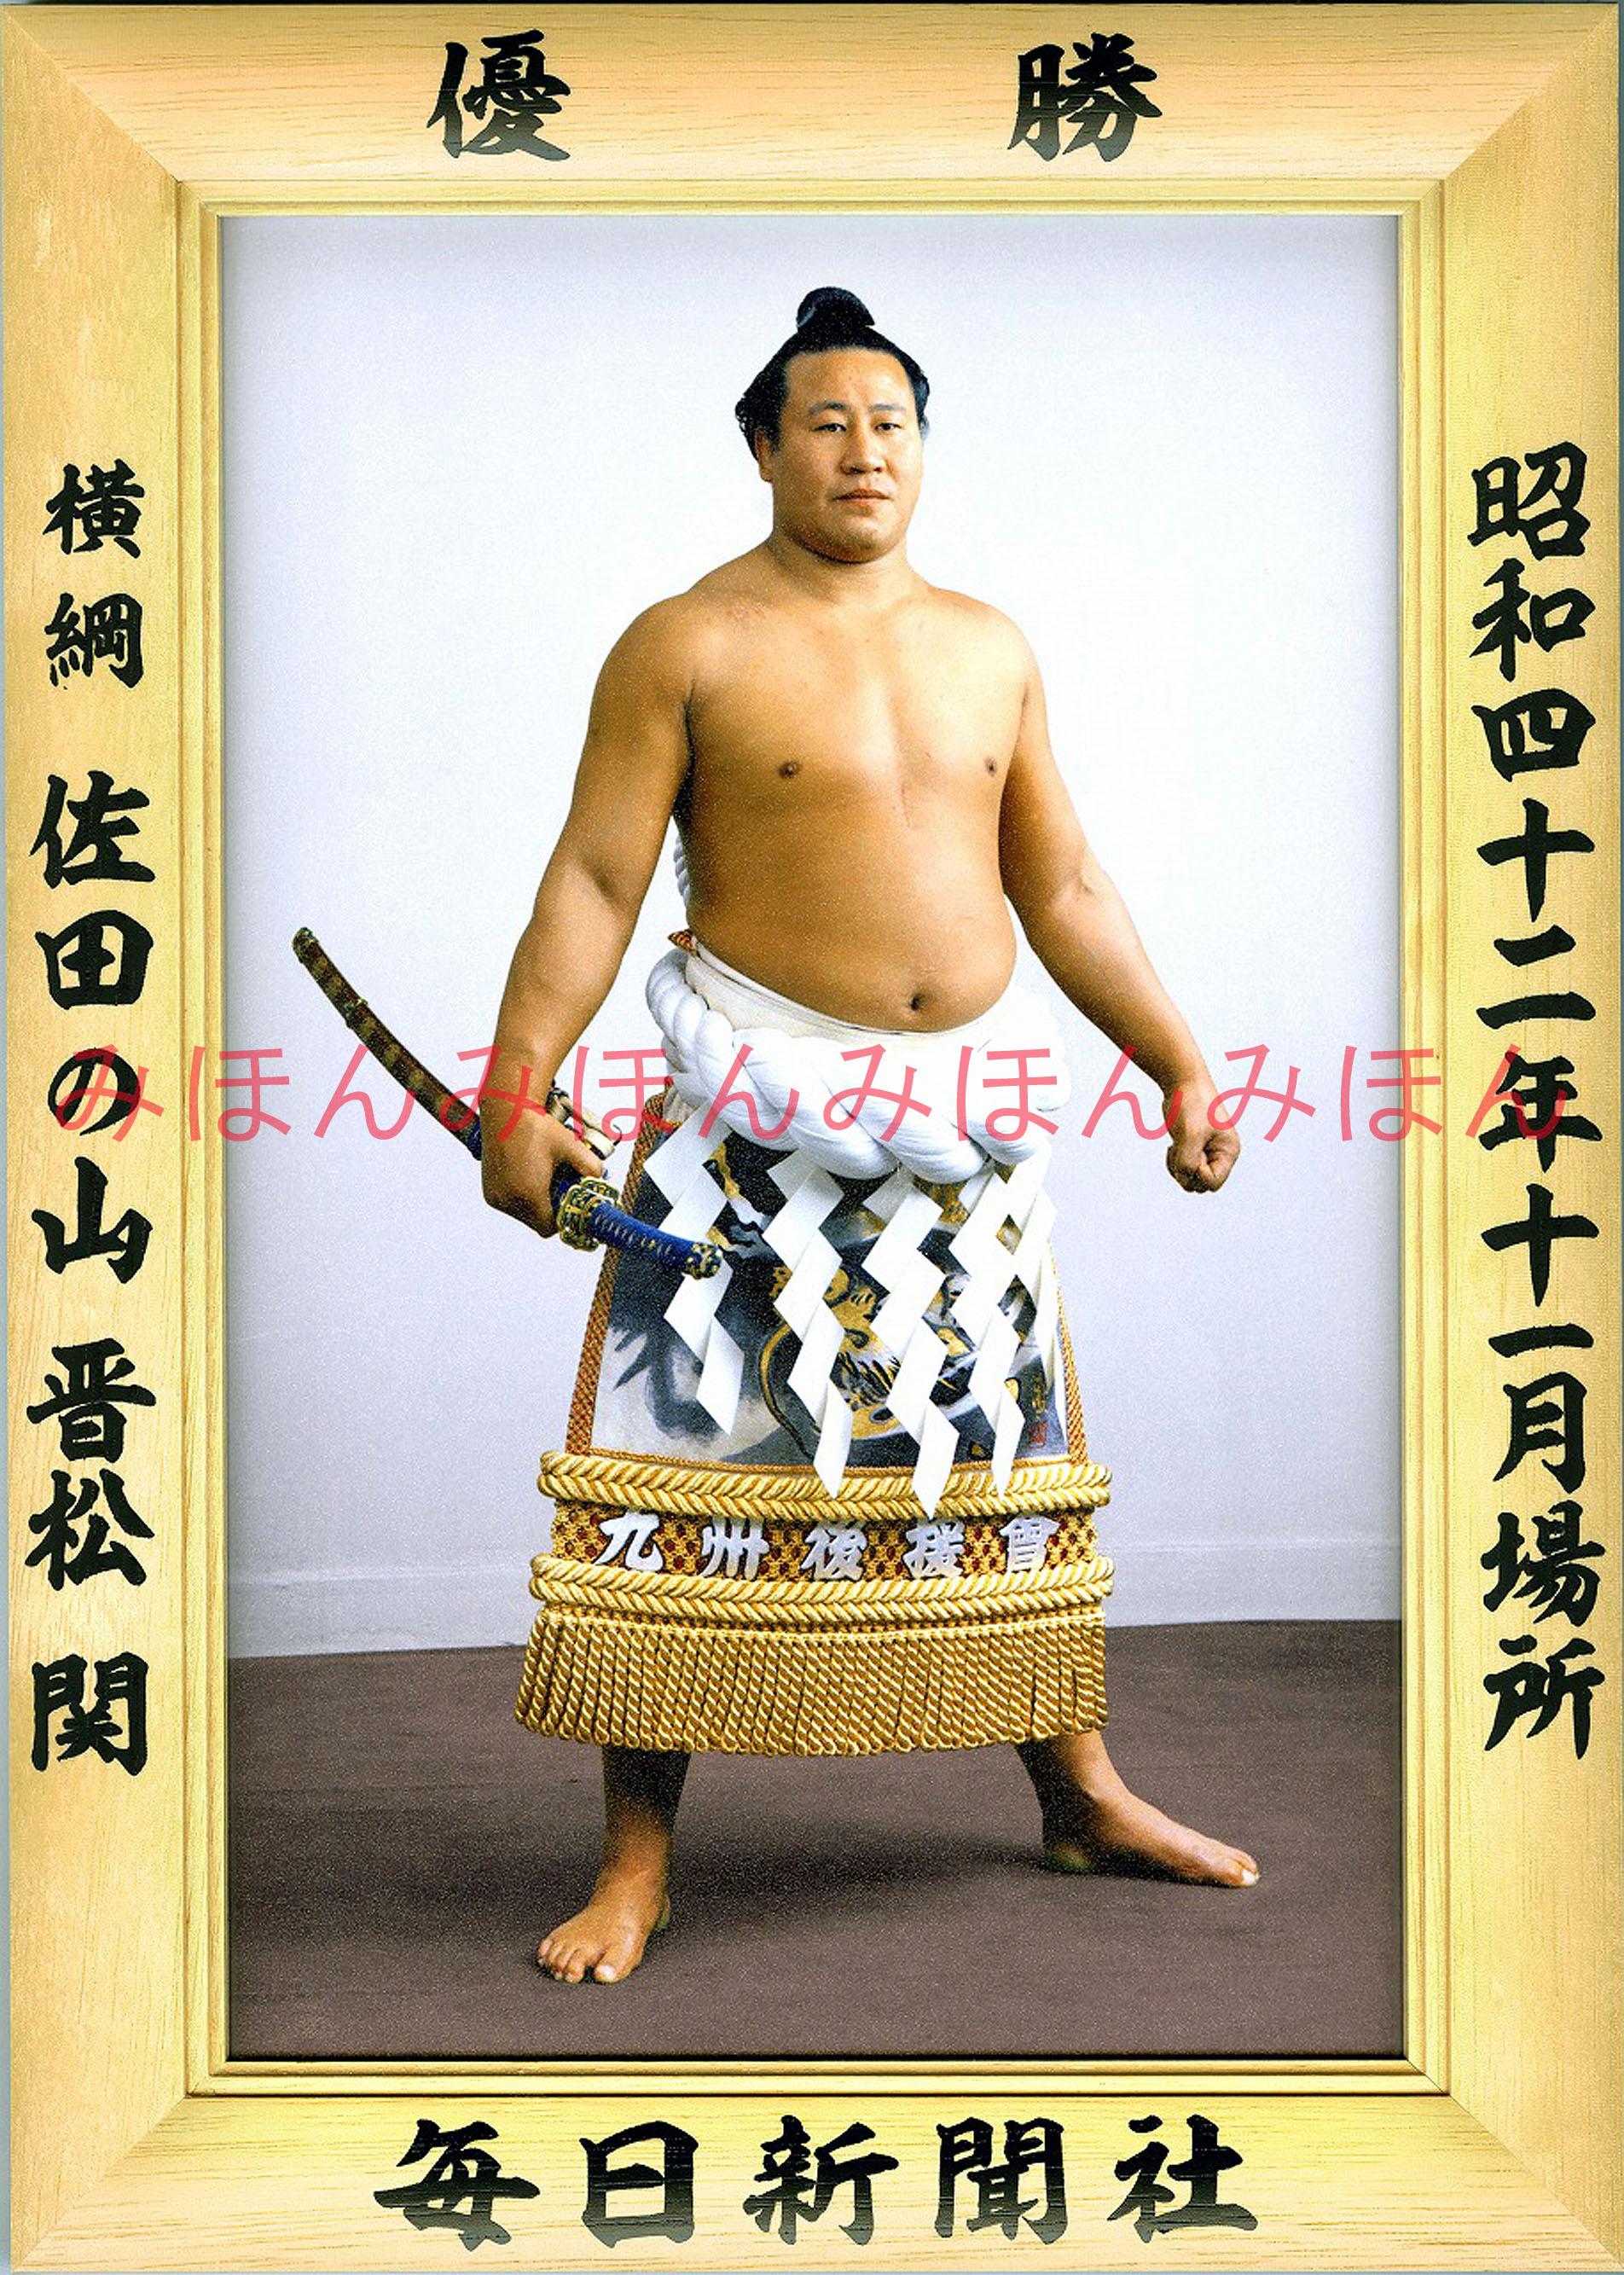 昭和42年11月場所優勝 横綱 佐田の山晋松関(5回目の優勝)